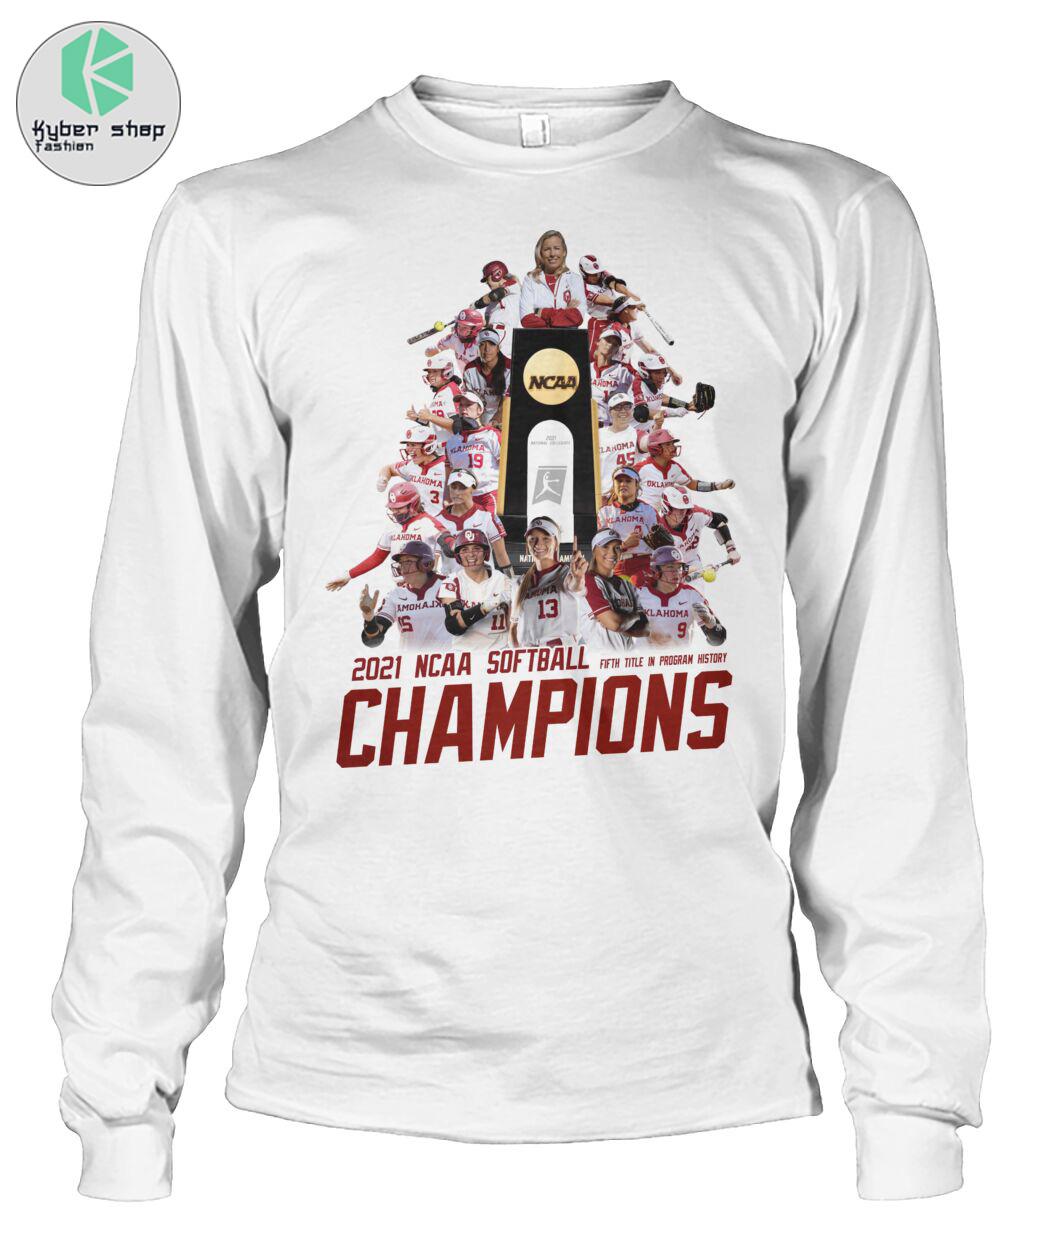 Oklahoma Sooners 2021 NCAA softball champions shirt 3